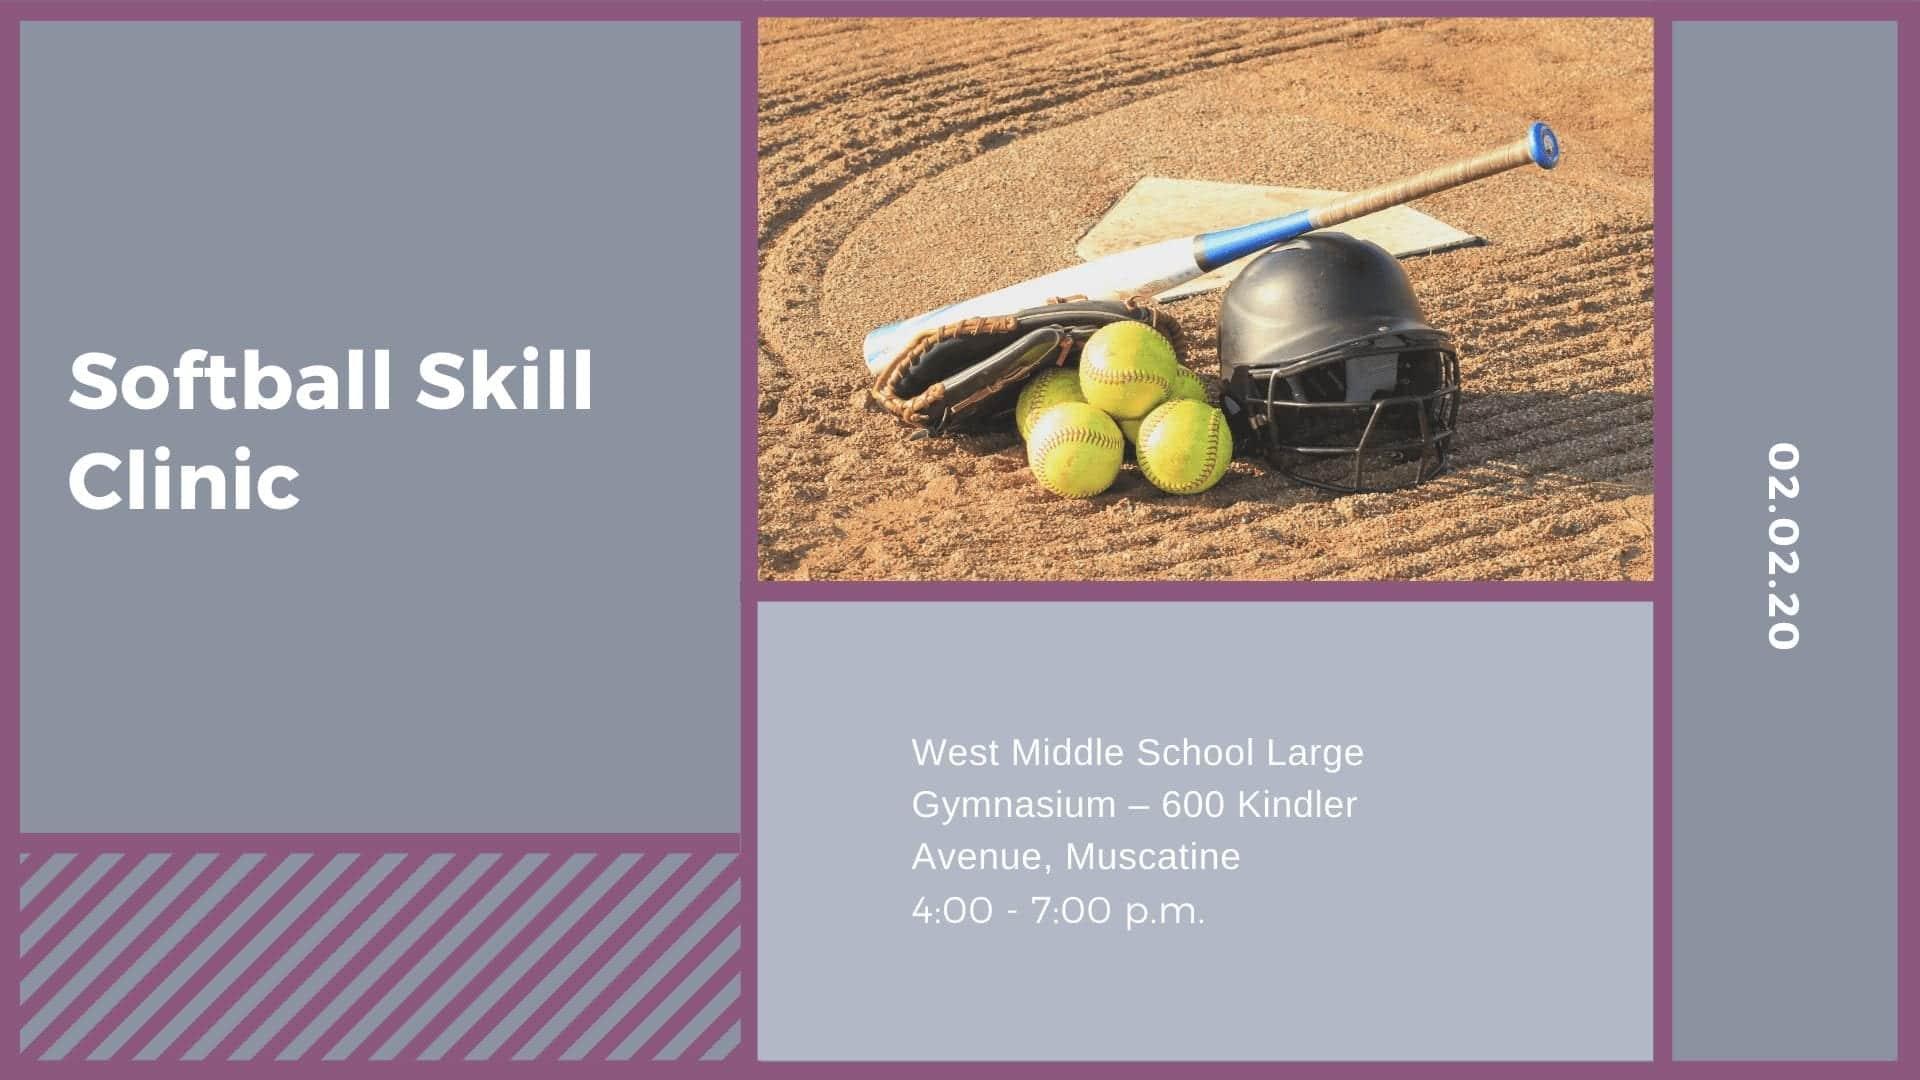 Softball Skill Clinic